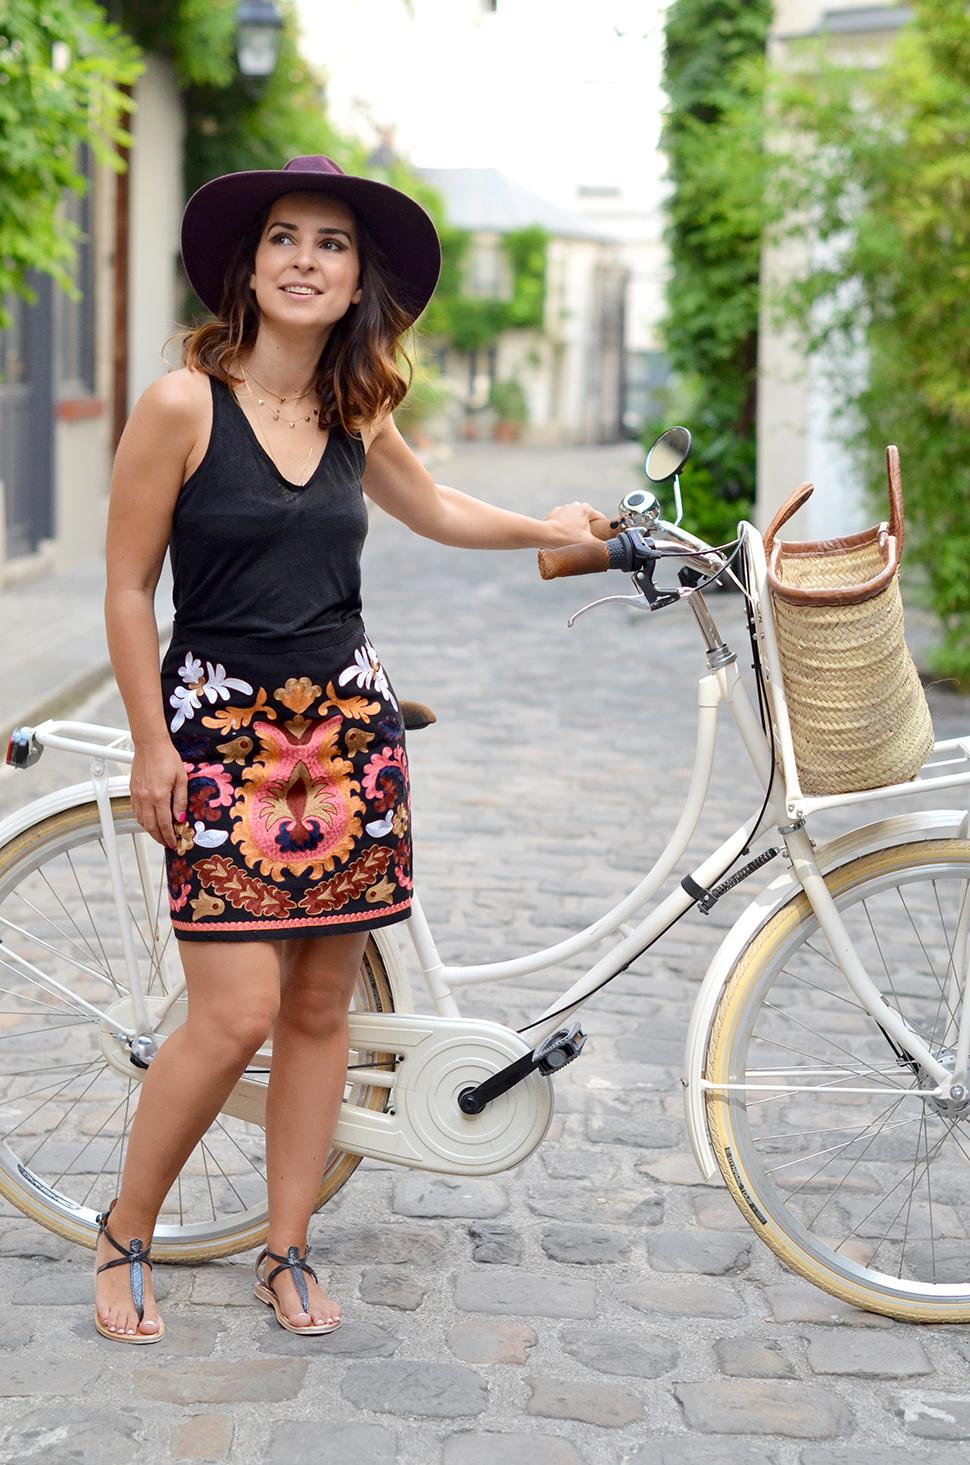 Helloitsvalentine_bike_paris_8